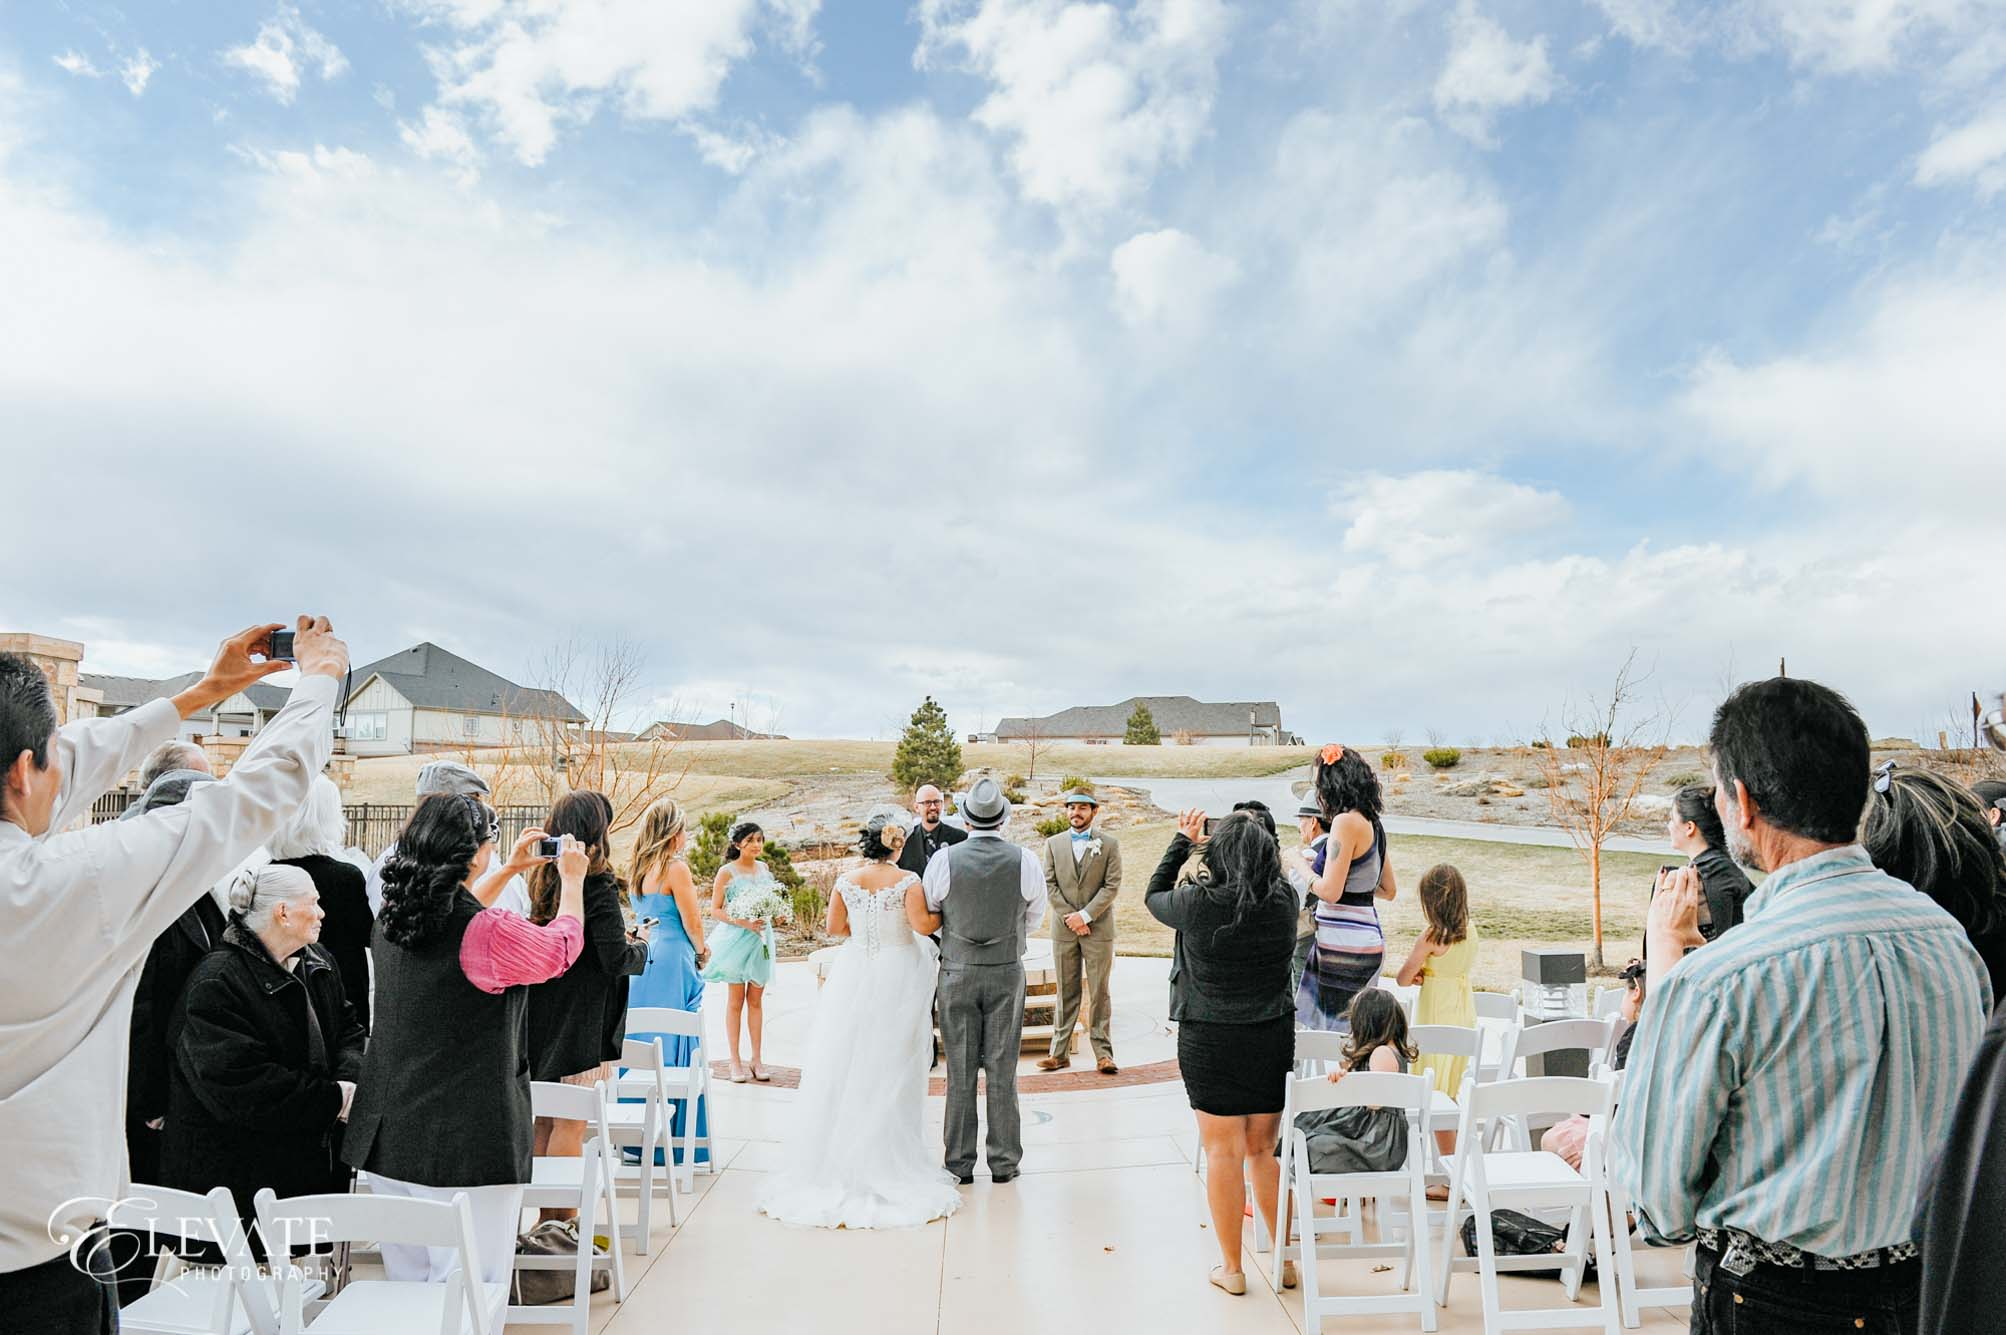 Aurora wedding ceremony outside